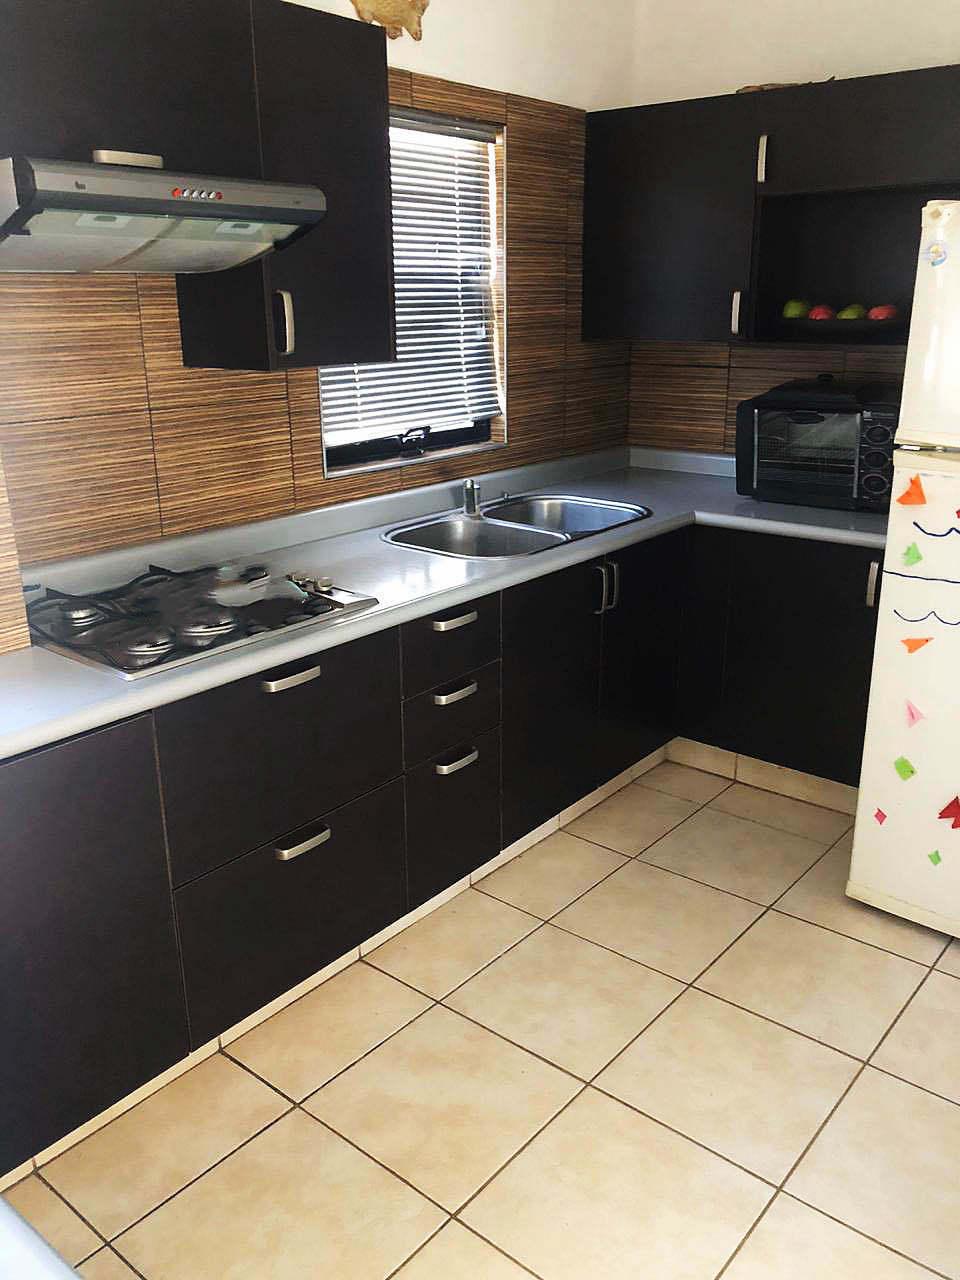 3 de 26: Cocina Integral con electrodomésticos. (Planta alta).